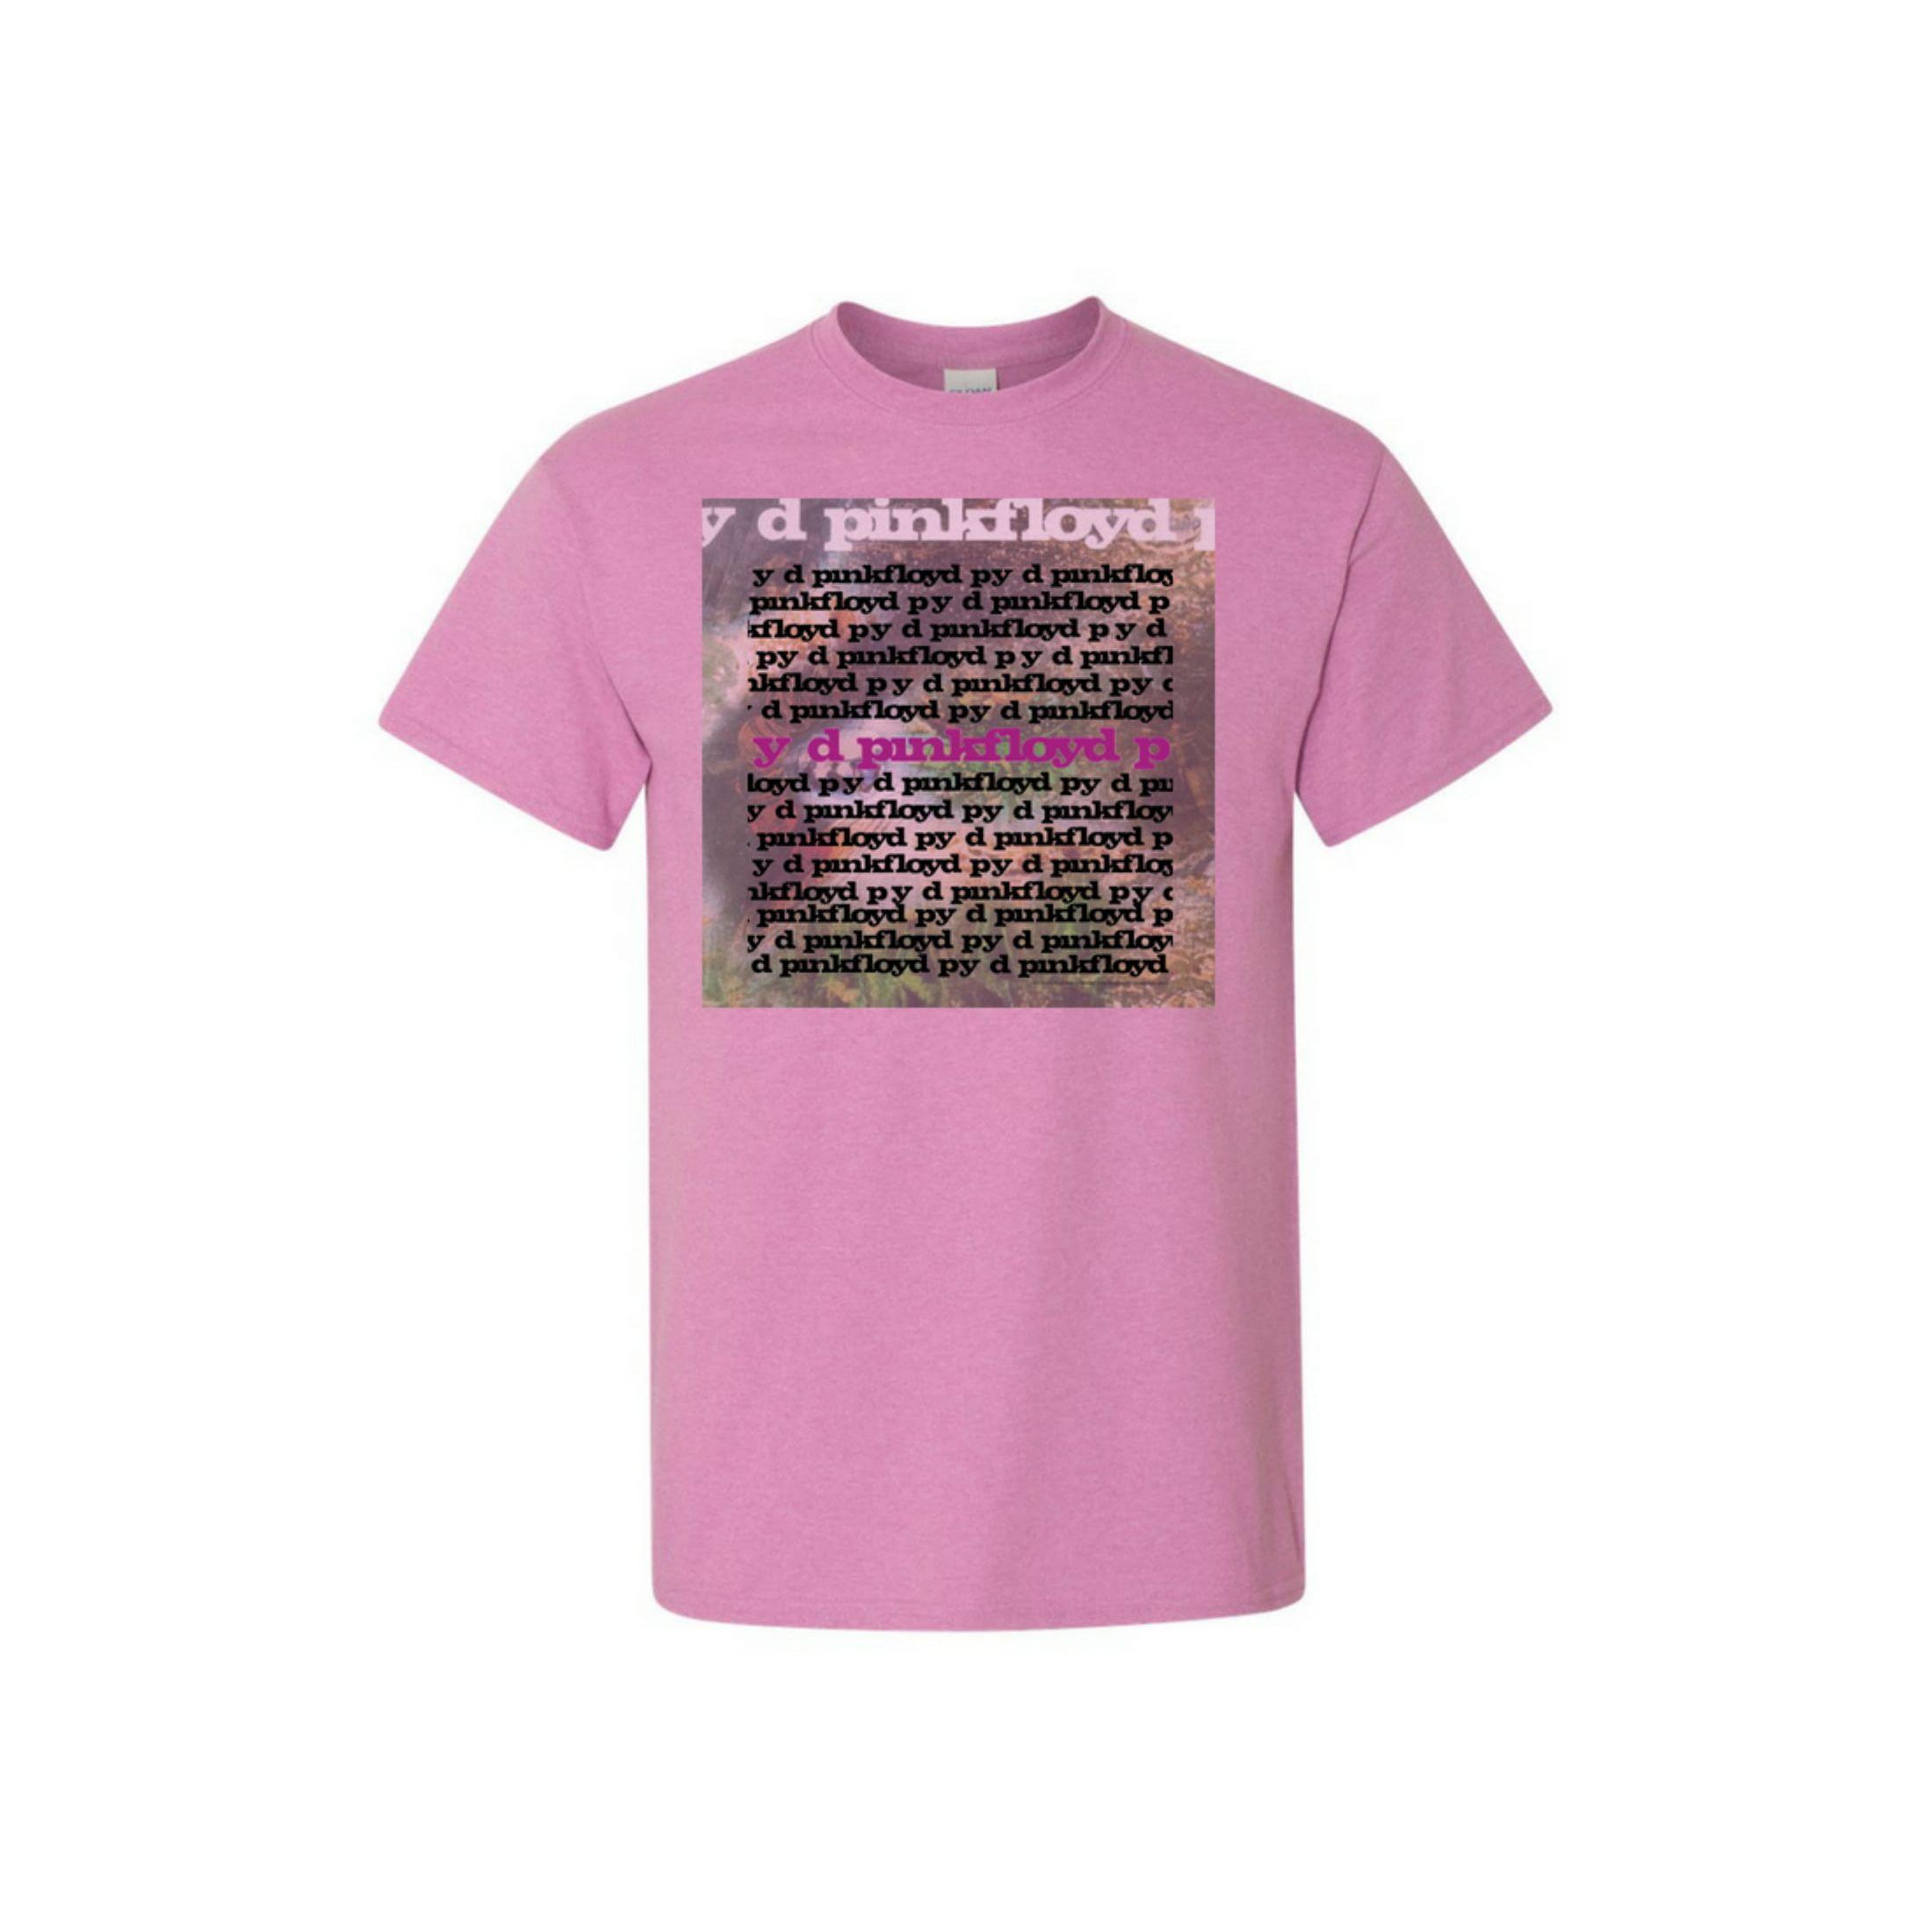 py d Album Artwork T-Shirt